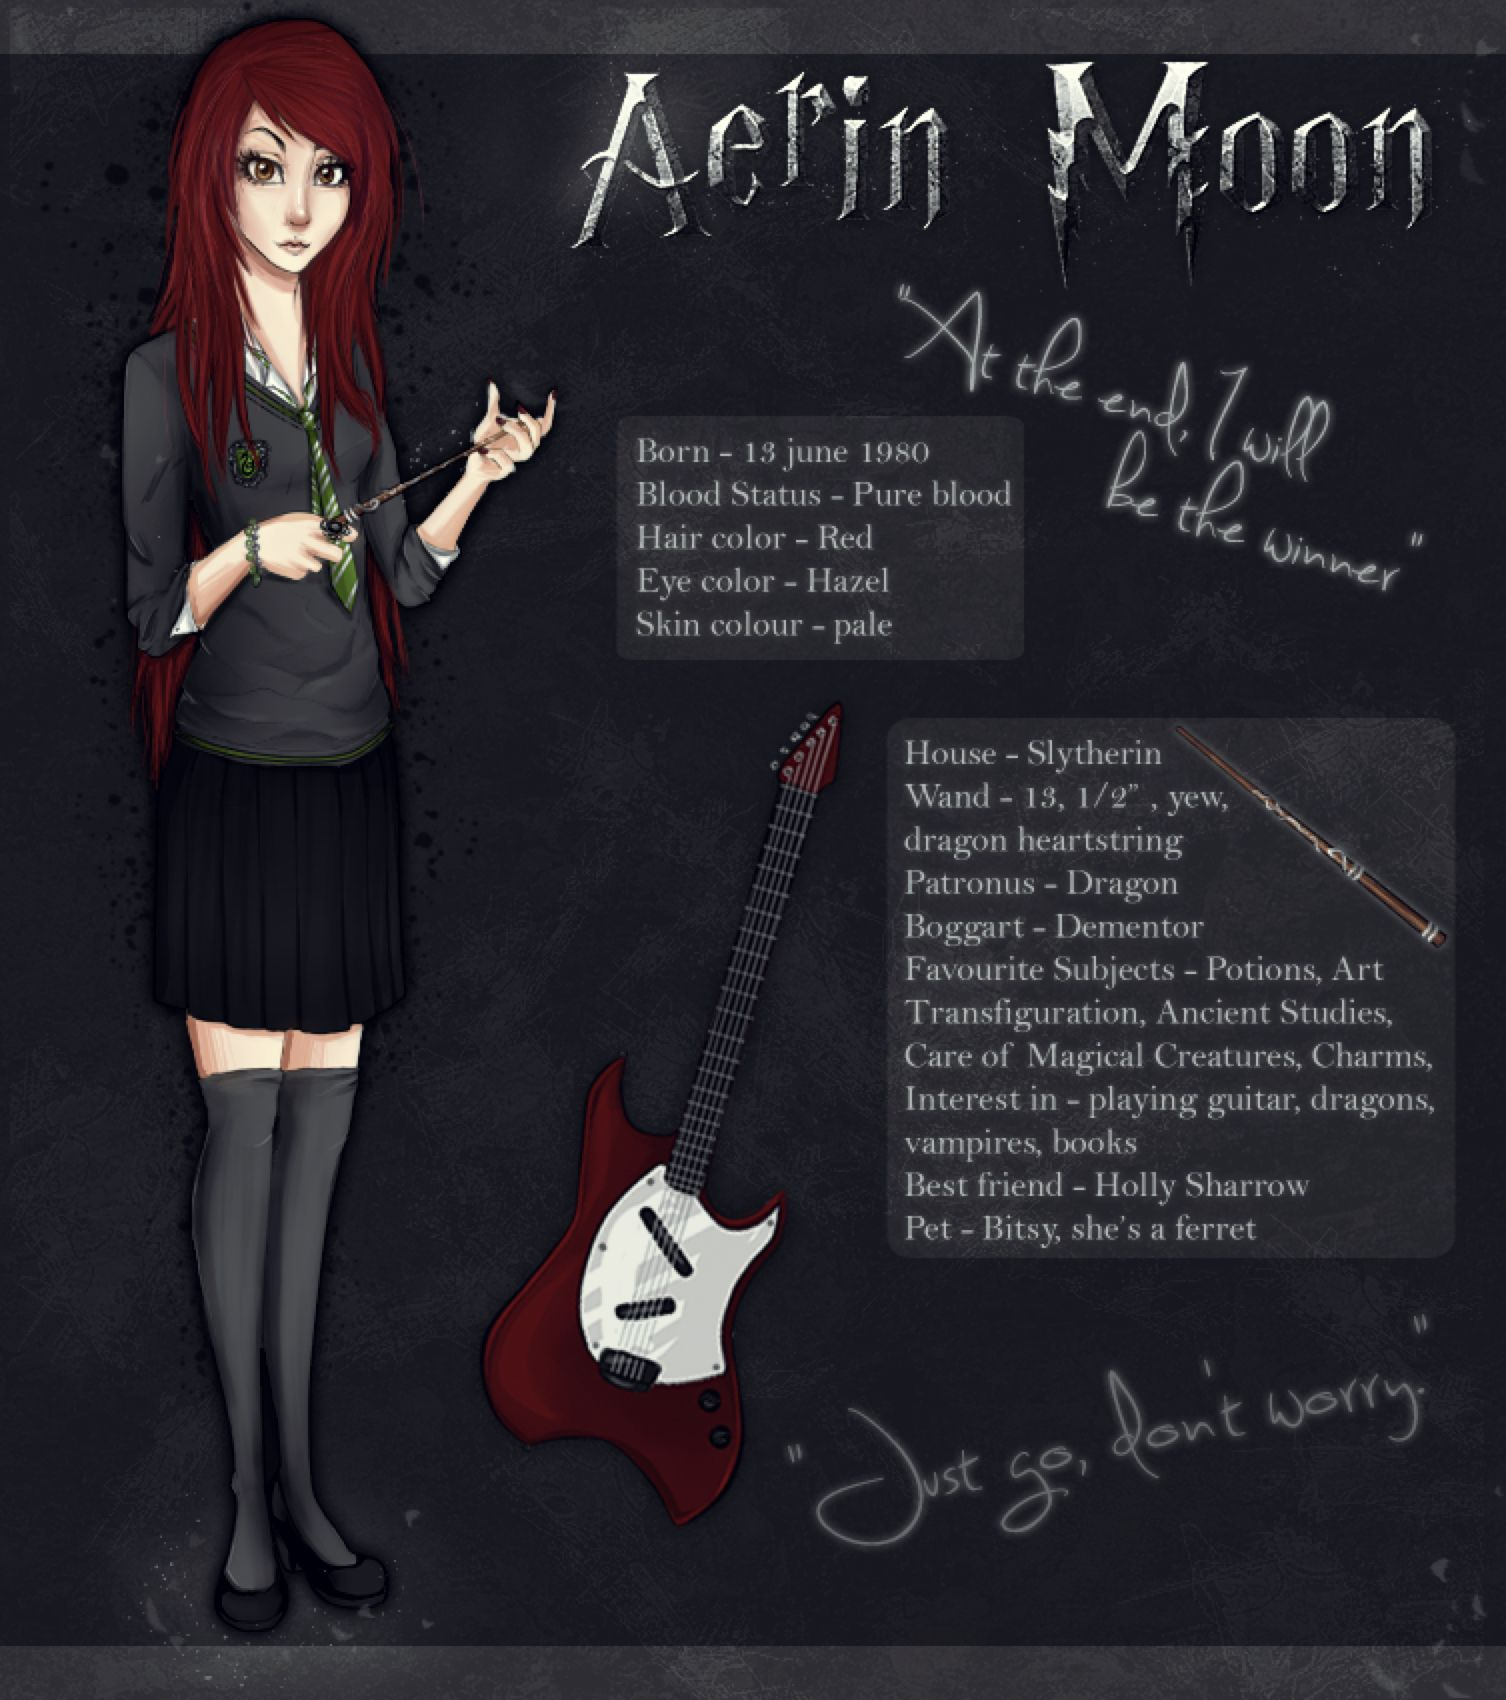 Harry Potter Oc Aerin Moon By Ilireth On Deviantart Harry Potter Oc Hp Harry Potter Potter